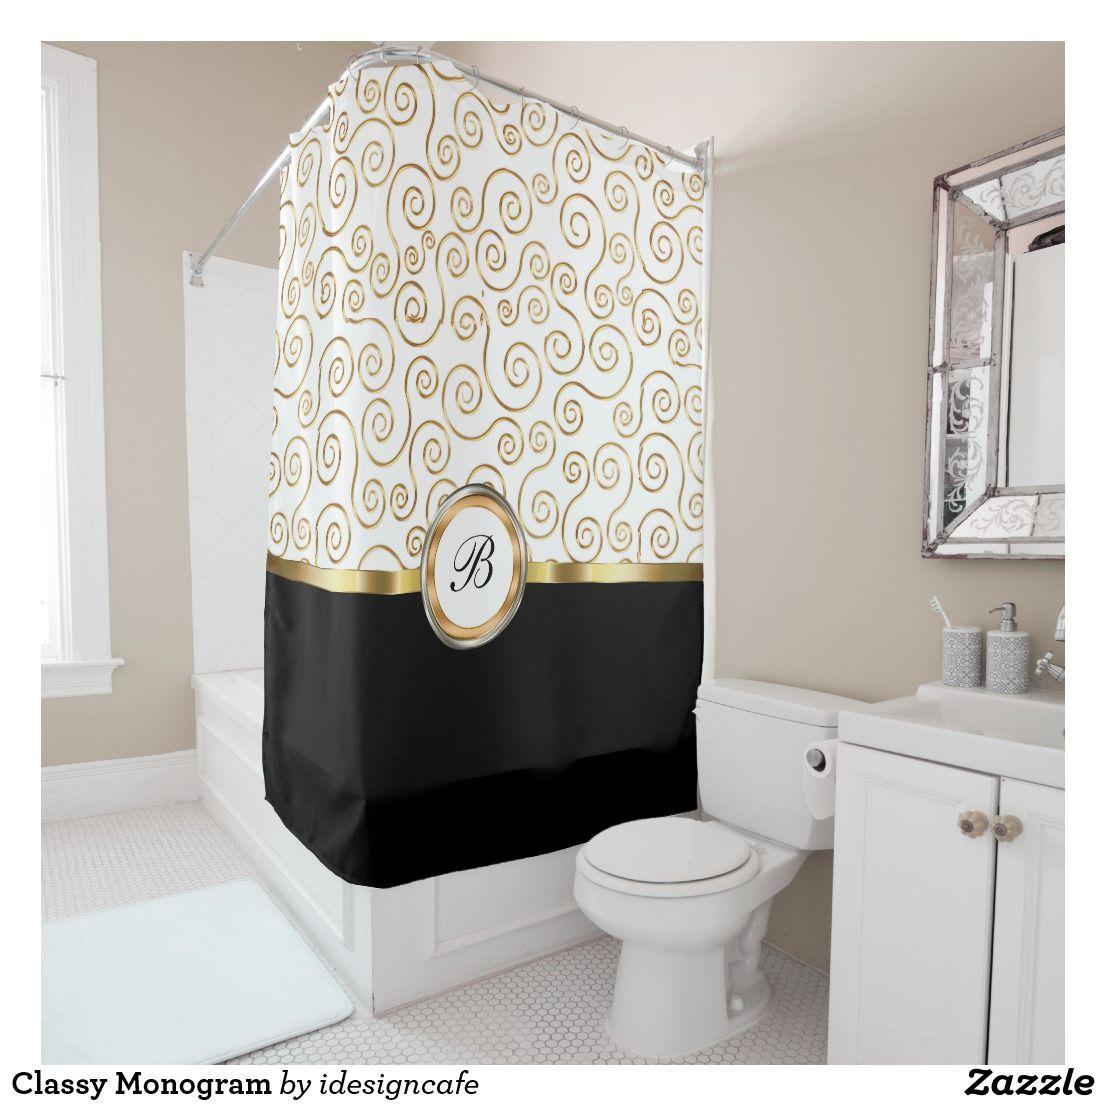 Classy Monogram Shower Curtain Zazzle Com Shower Curtain